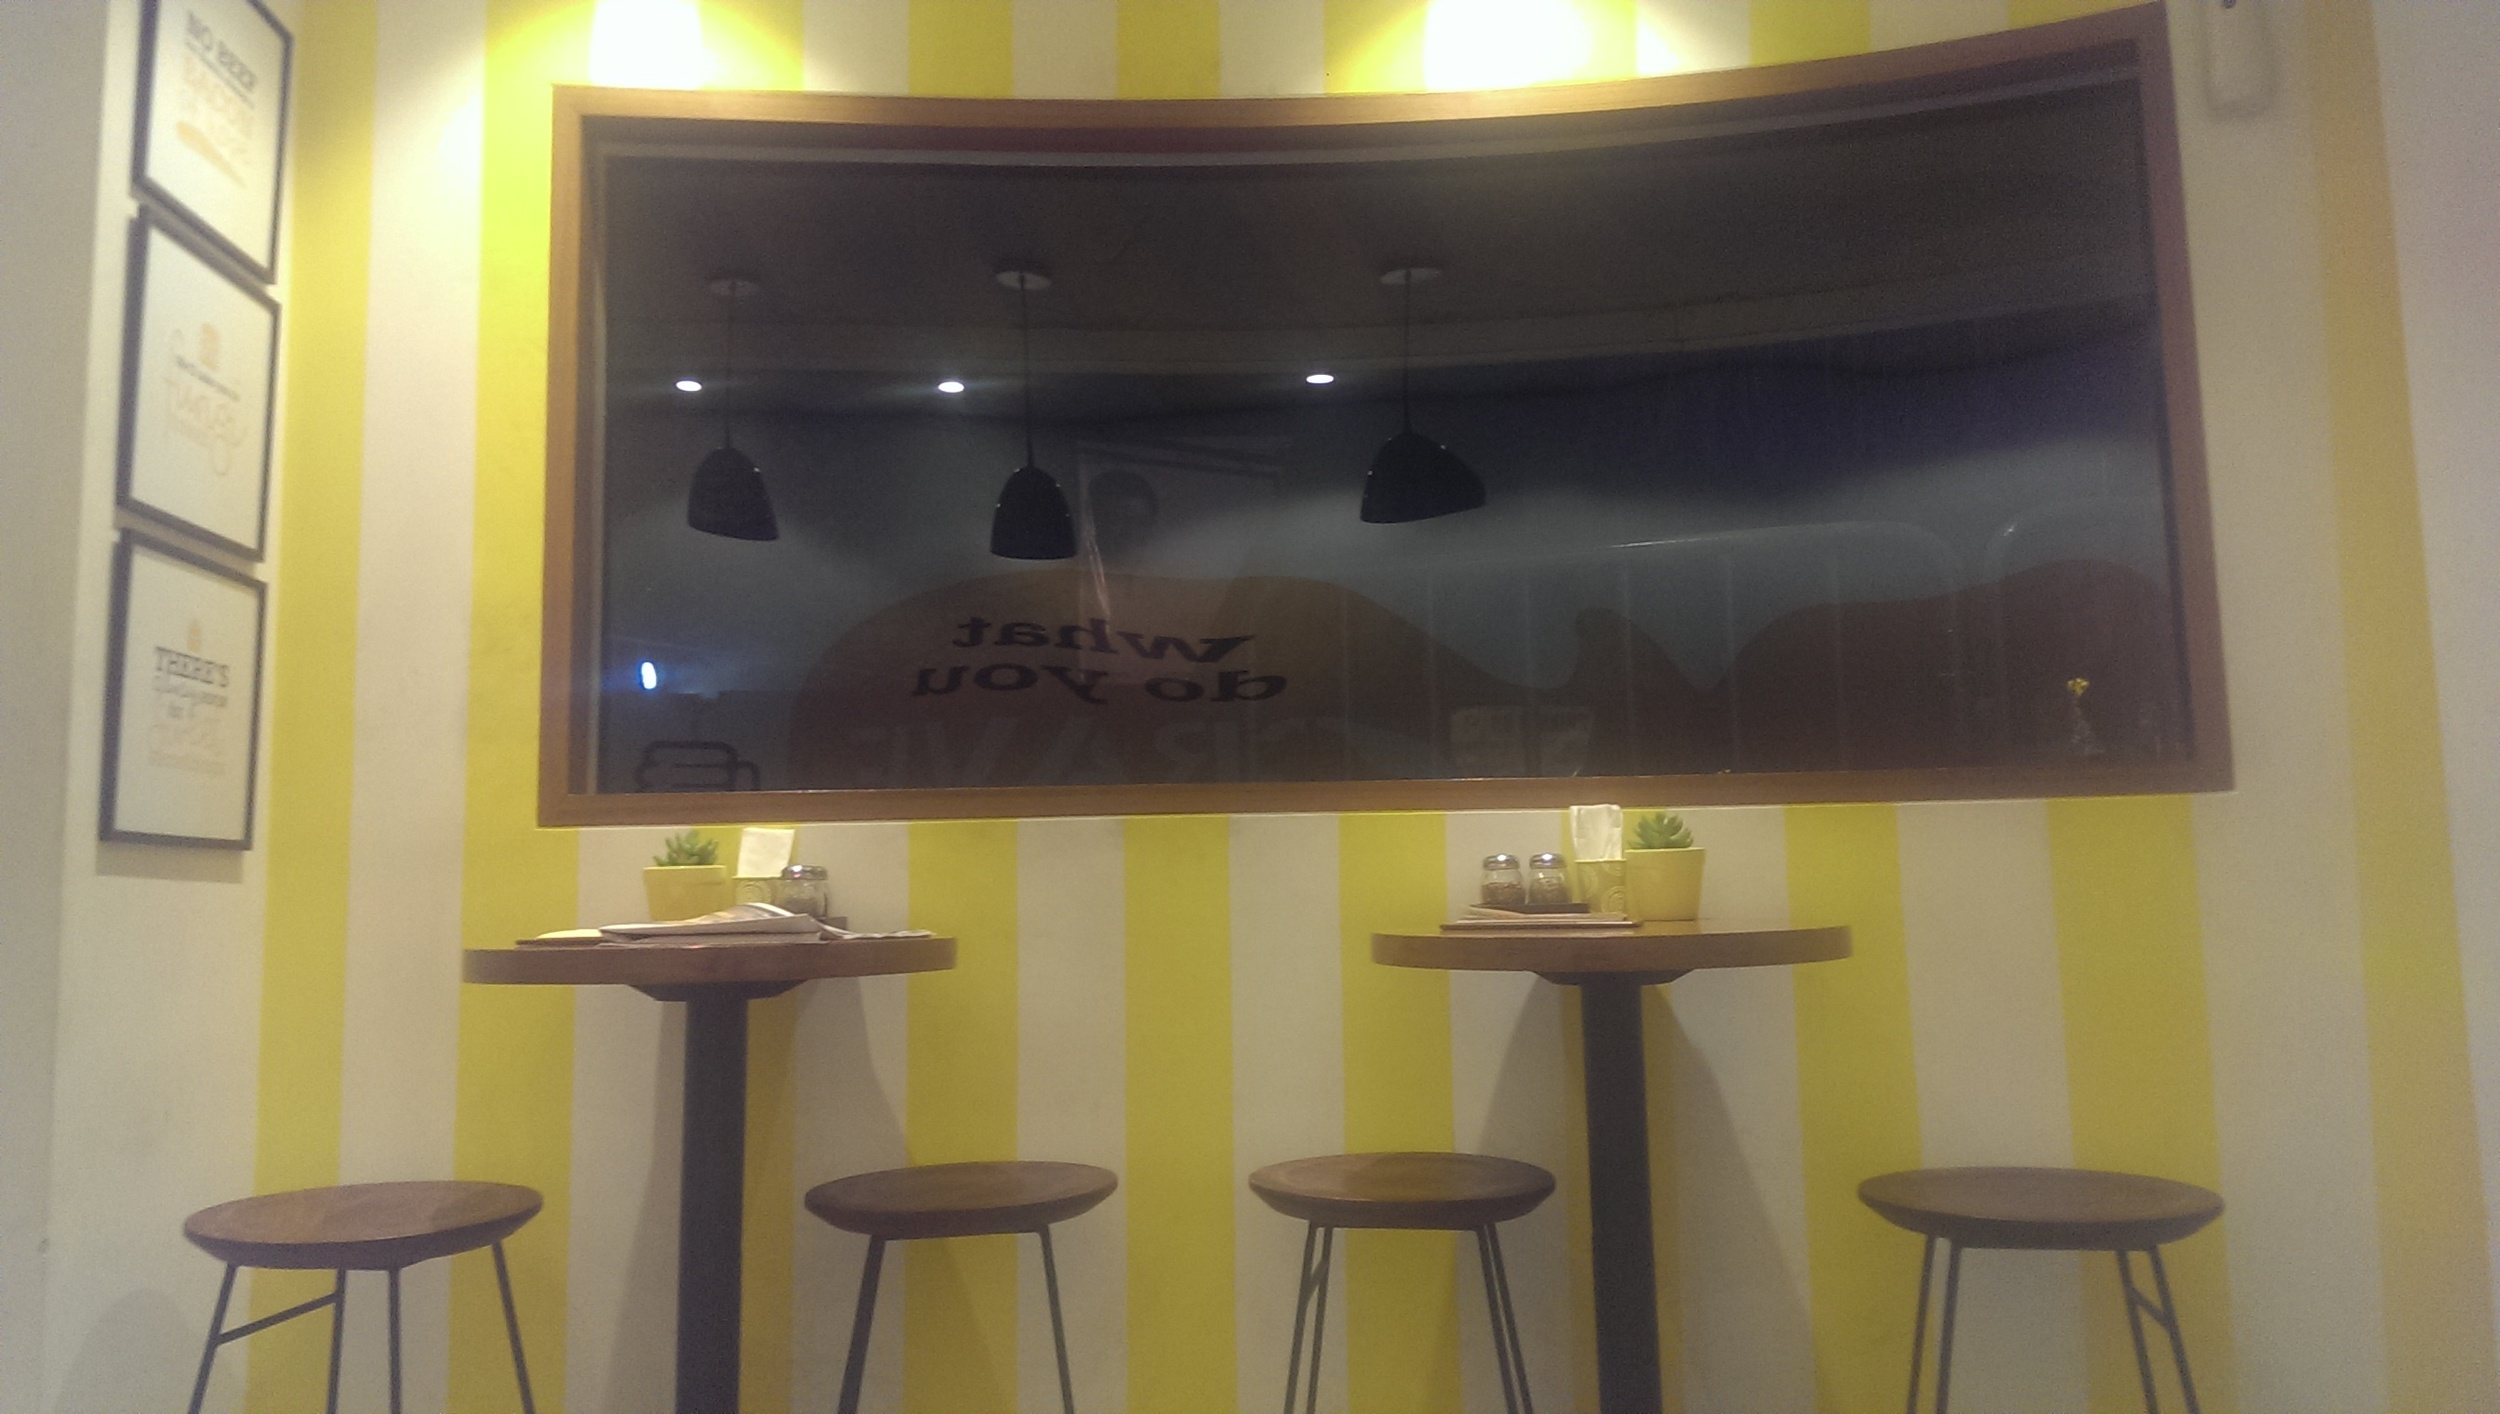 Bright Yellow Interiors @ Crave, Prabhadevi